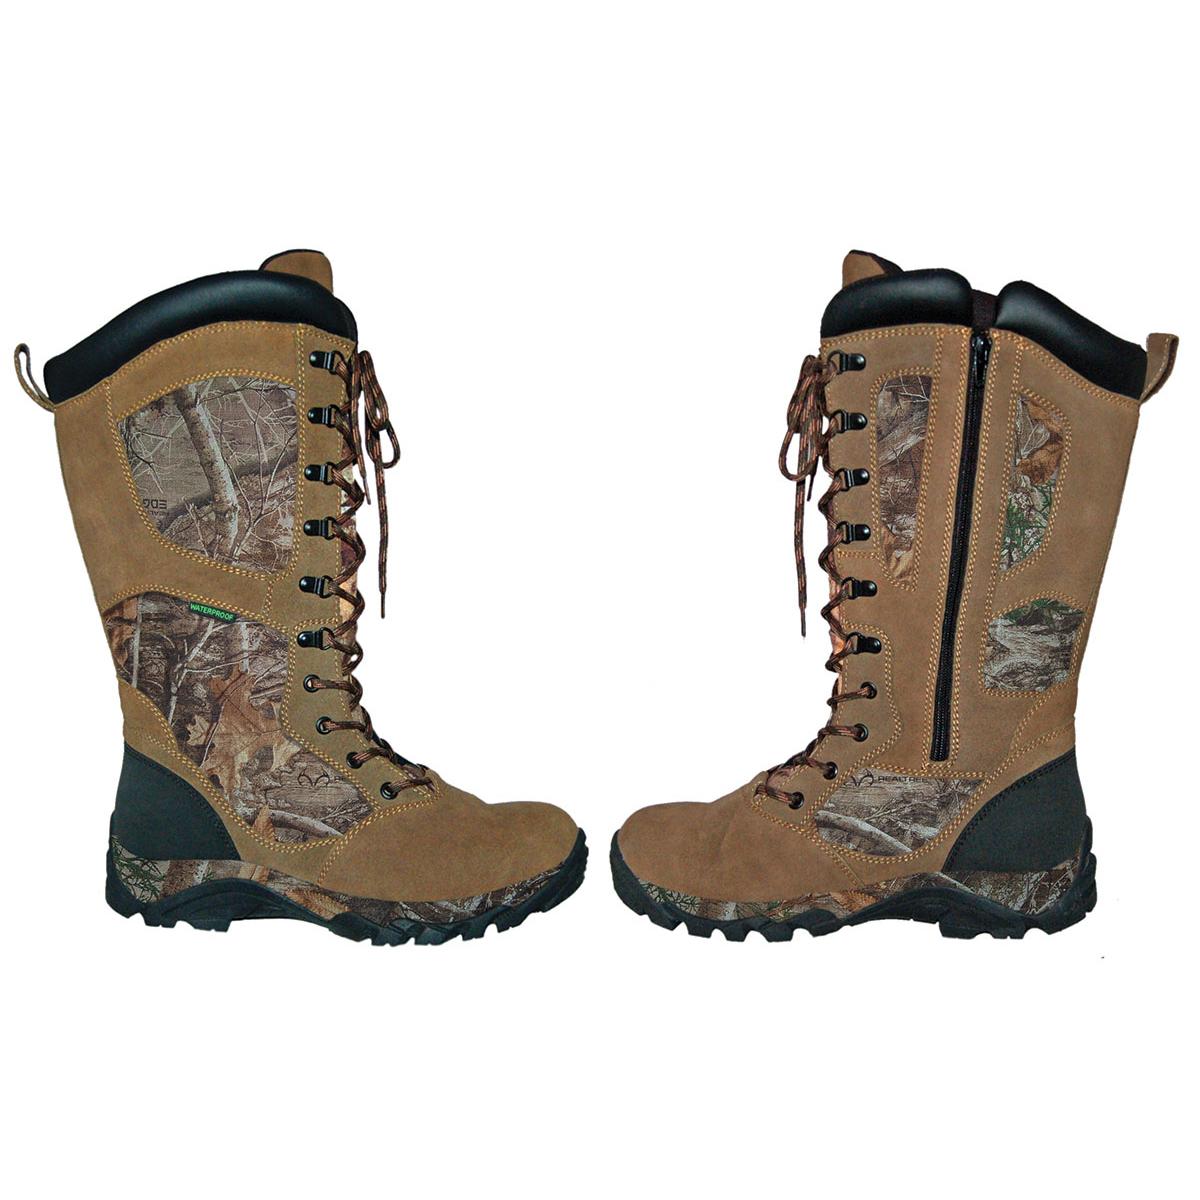 Itasca Men's Safeguard 15″ Snakeproof Hunting Boot